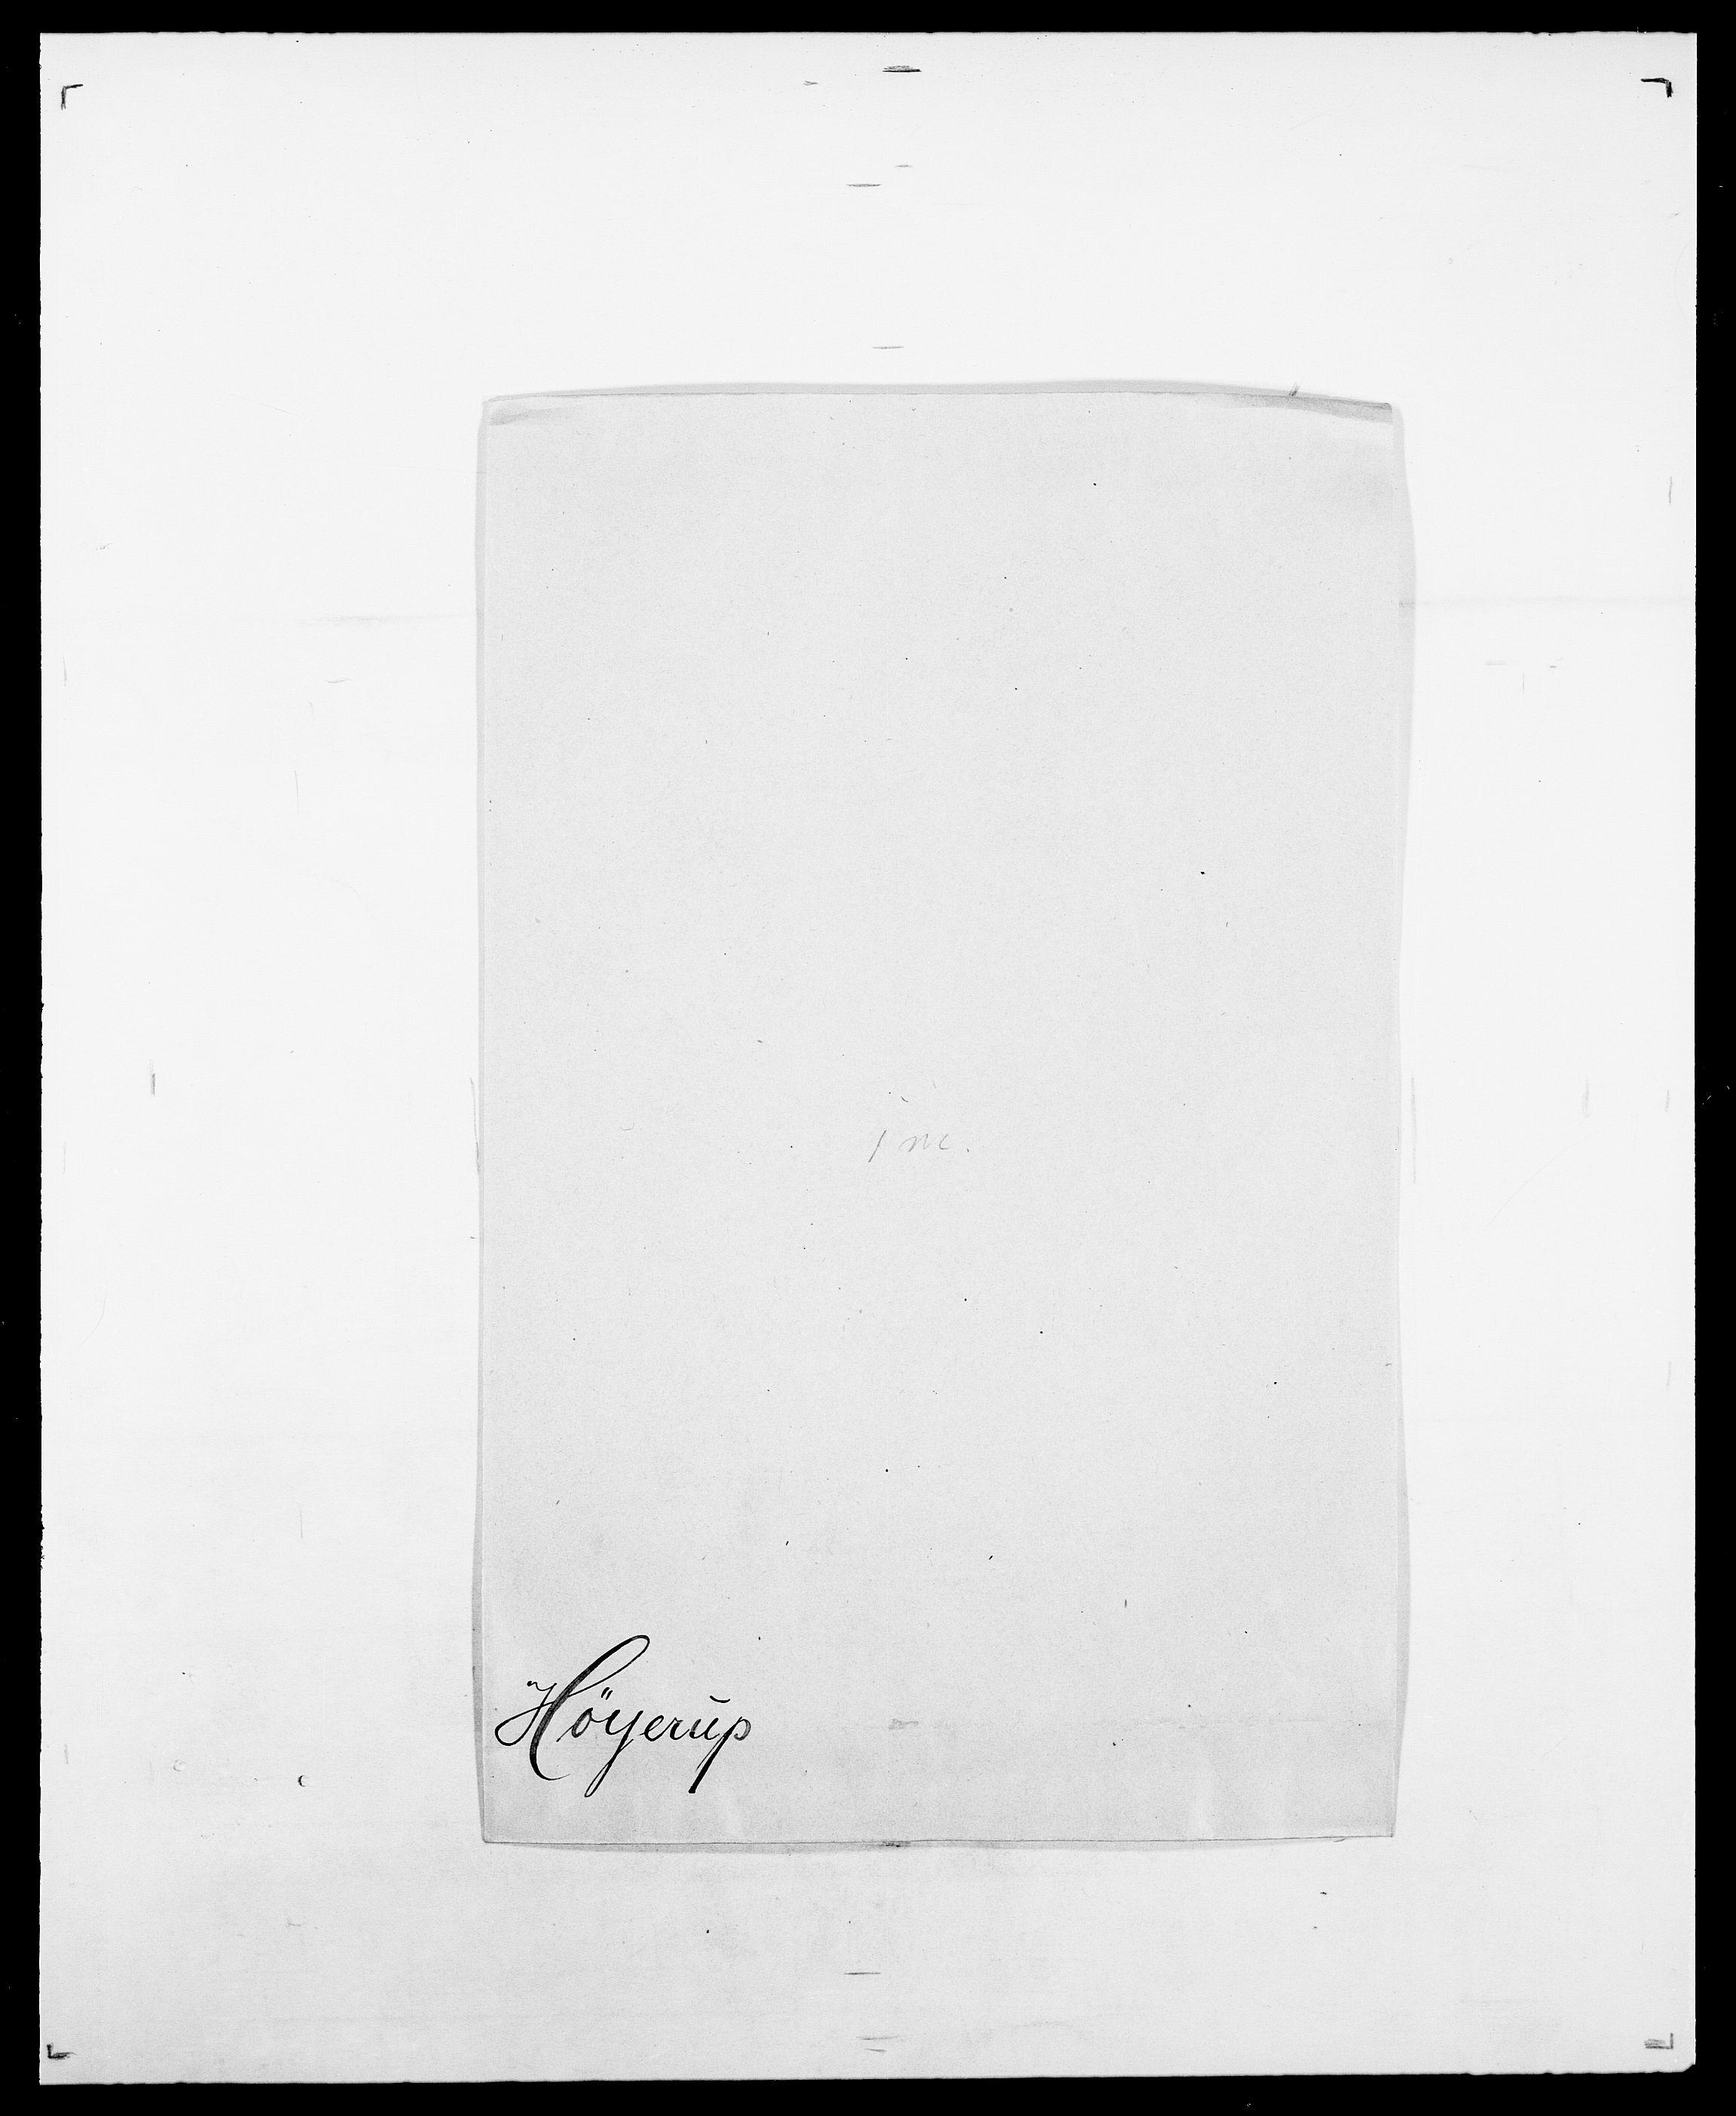 SAO, Delgobe, Charles Antoine - samling, D/Da/L0019: van der Hude - Joys, s. 462